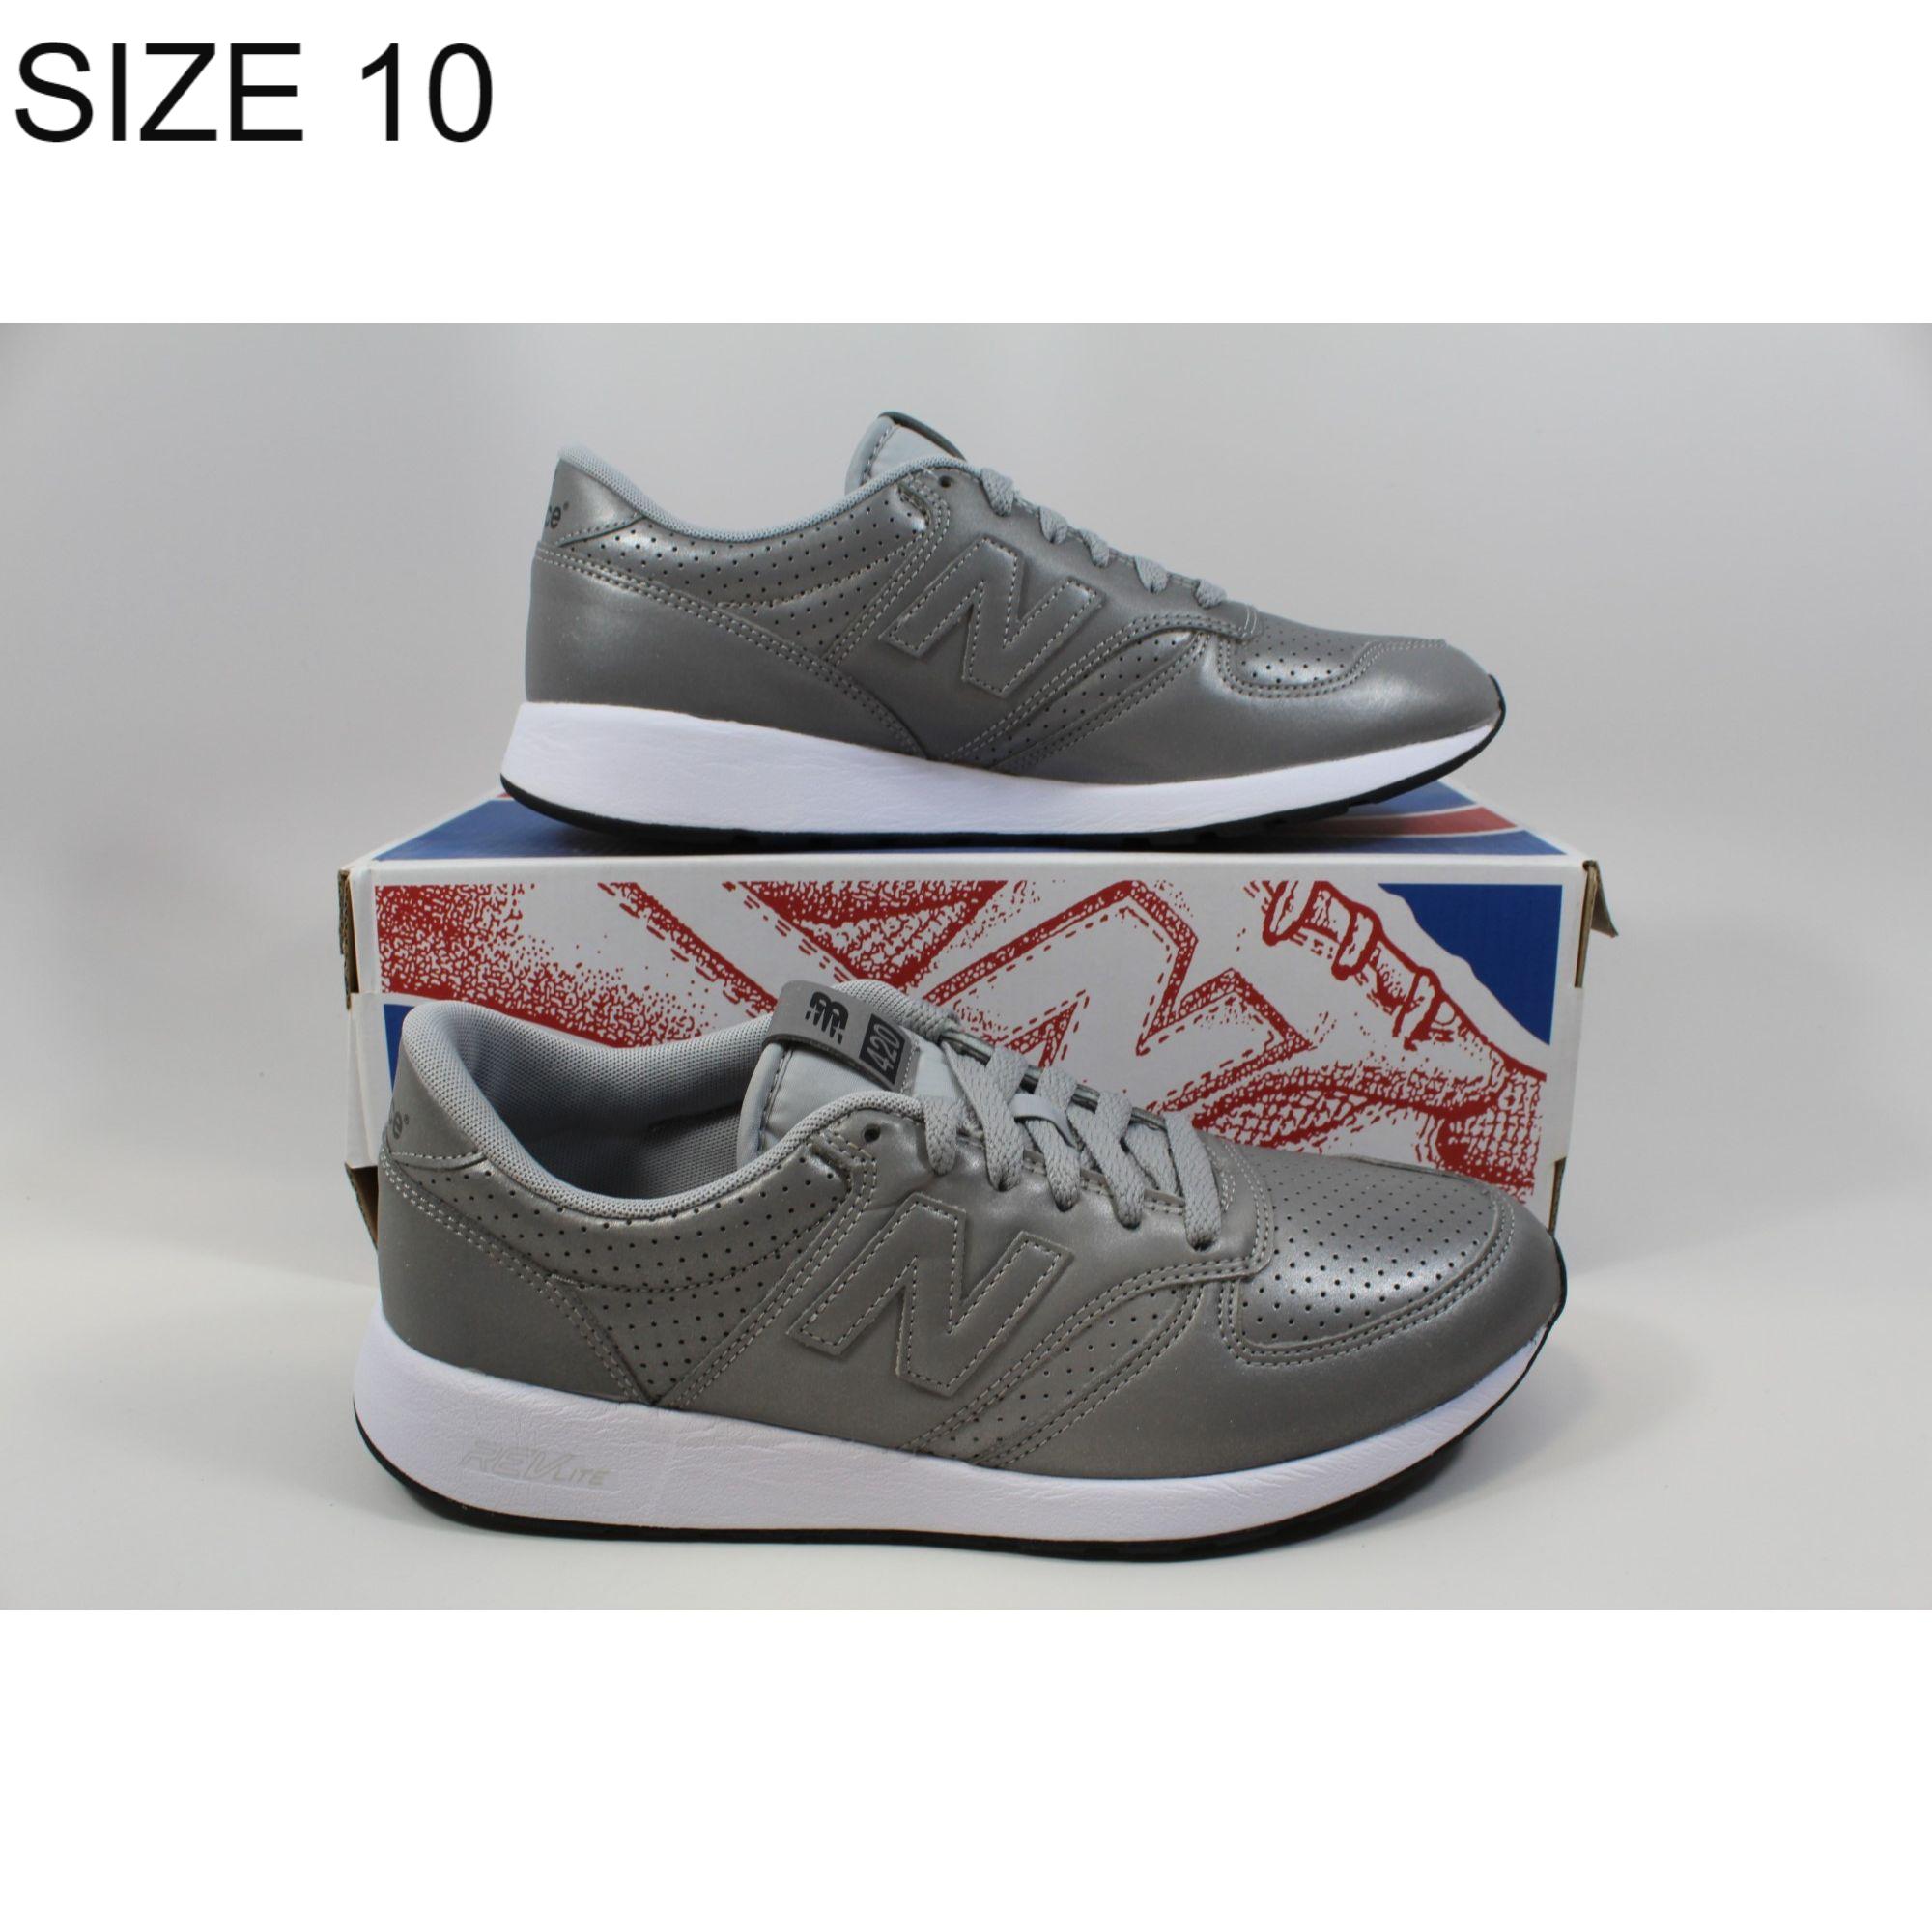 new balance 420 size 10